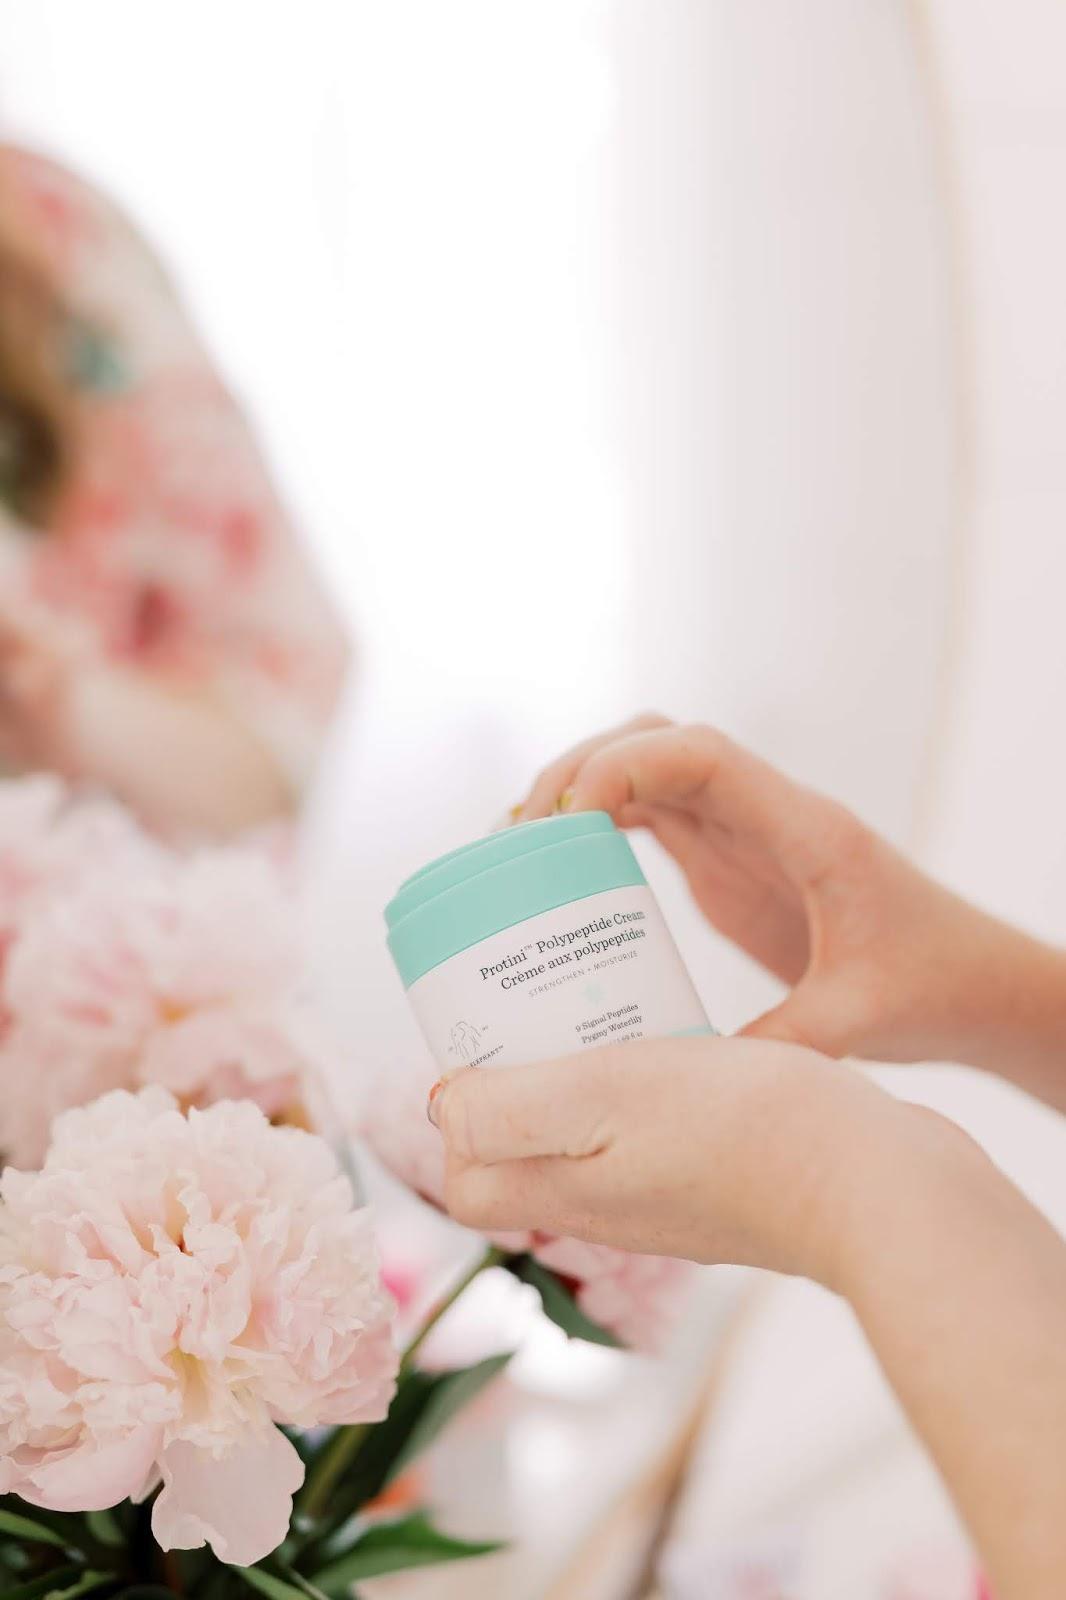 Drunk Elephant Protini Polypeptide Cream - Affordable by Amanda - Nighttime Skincare Routine Moisturizer